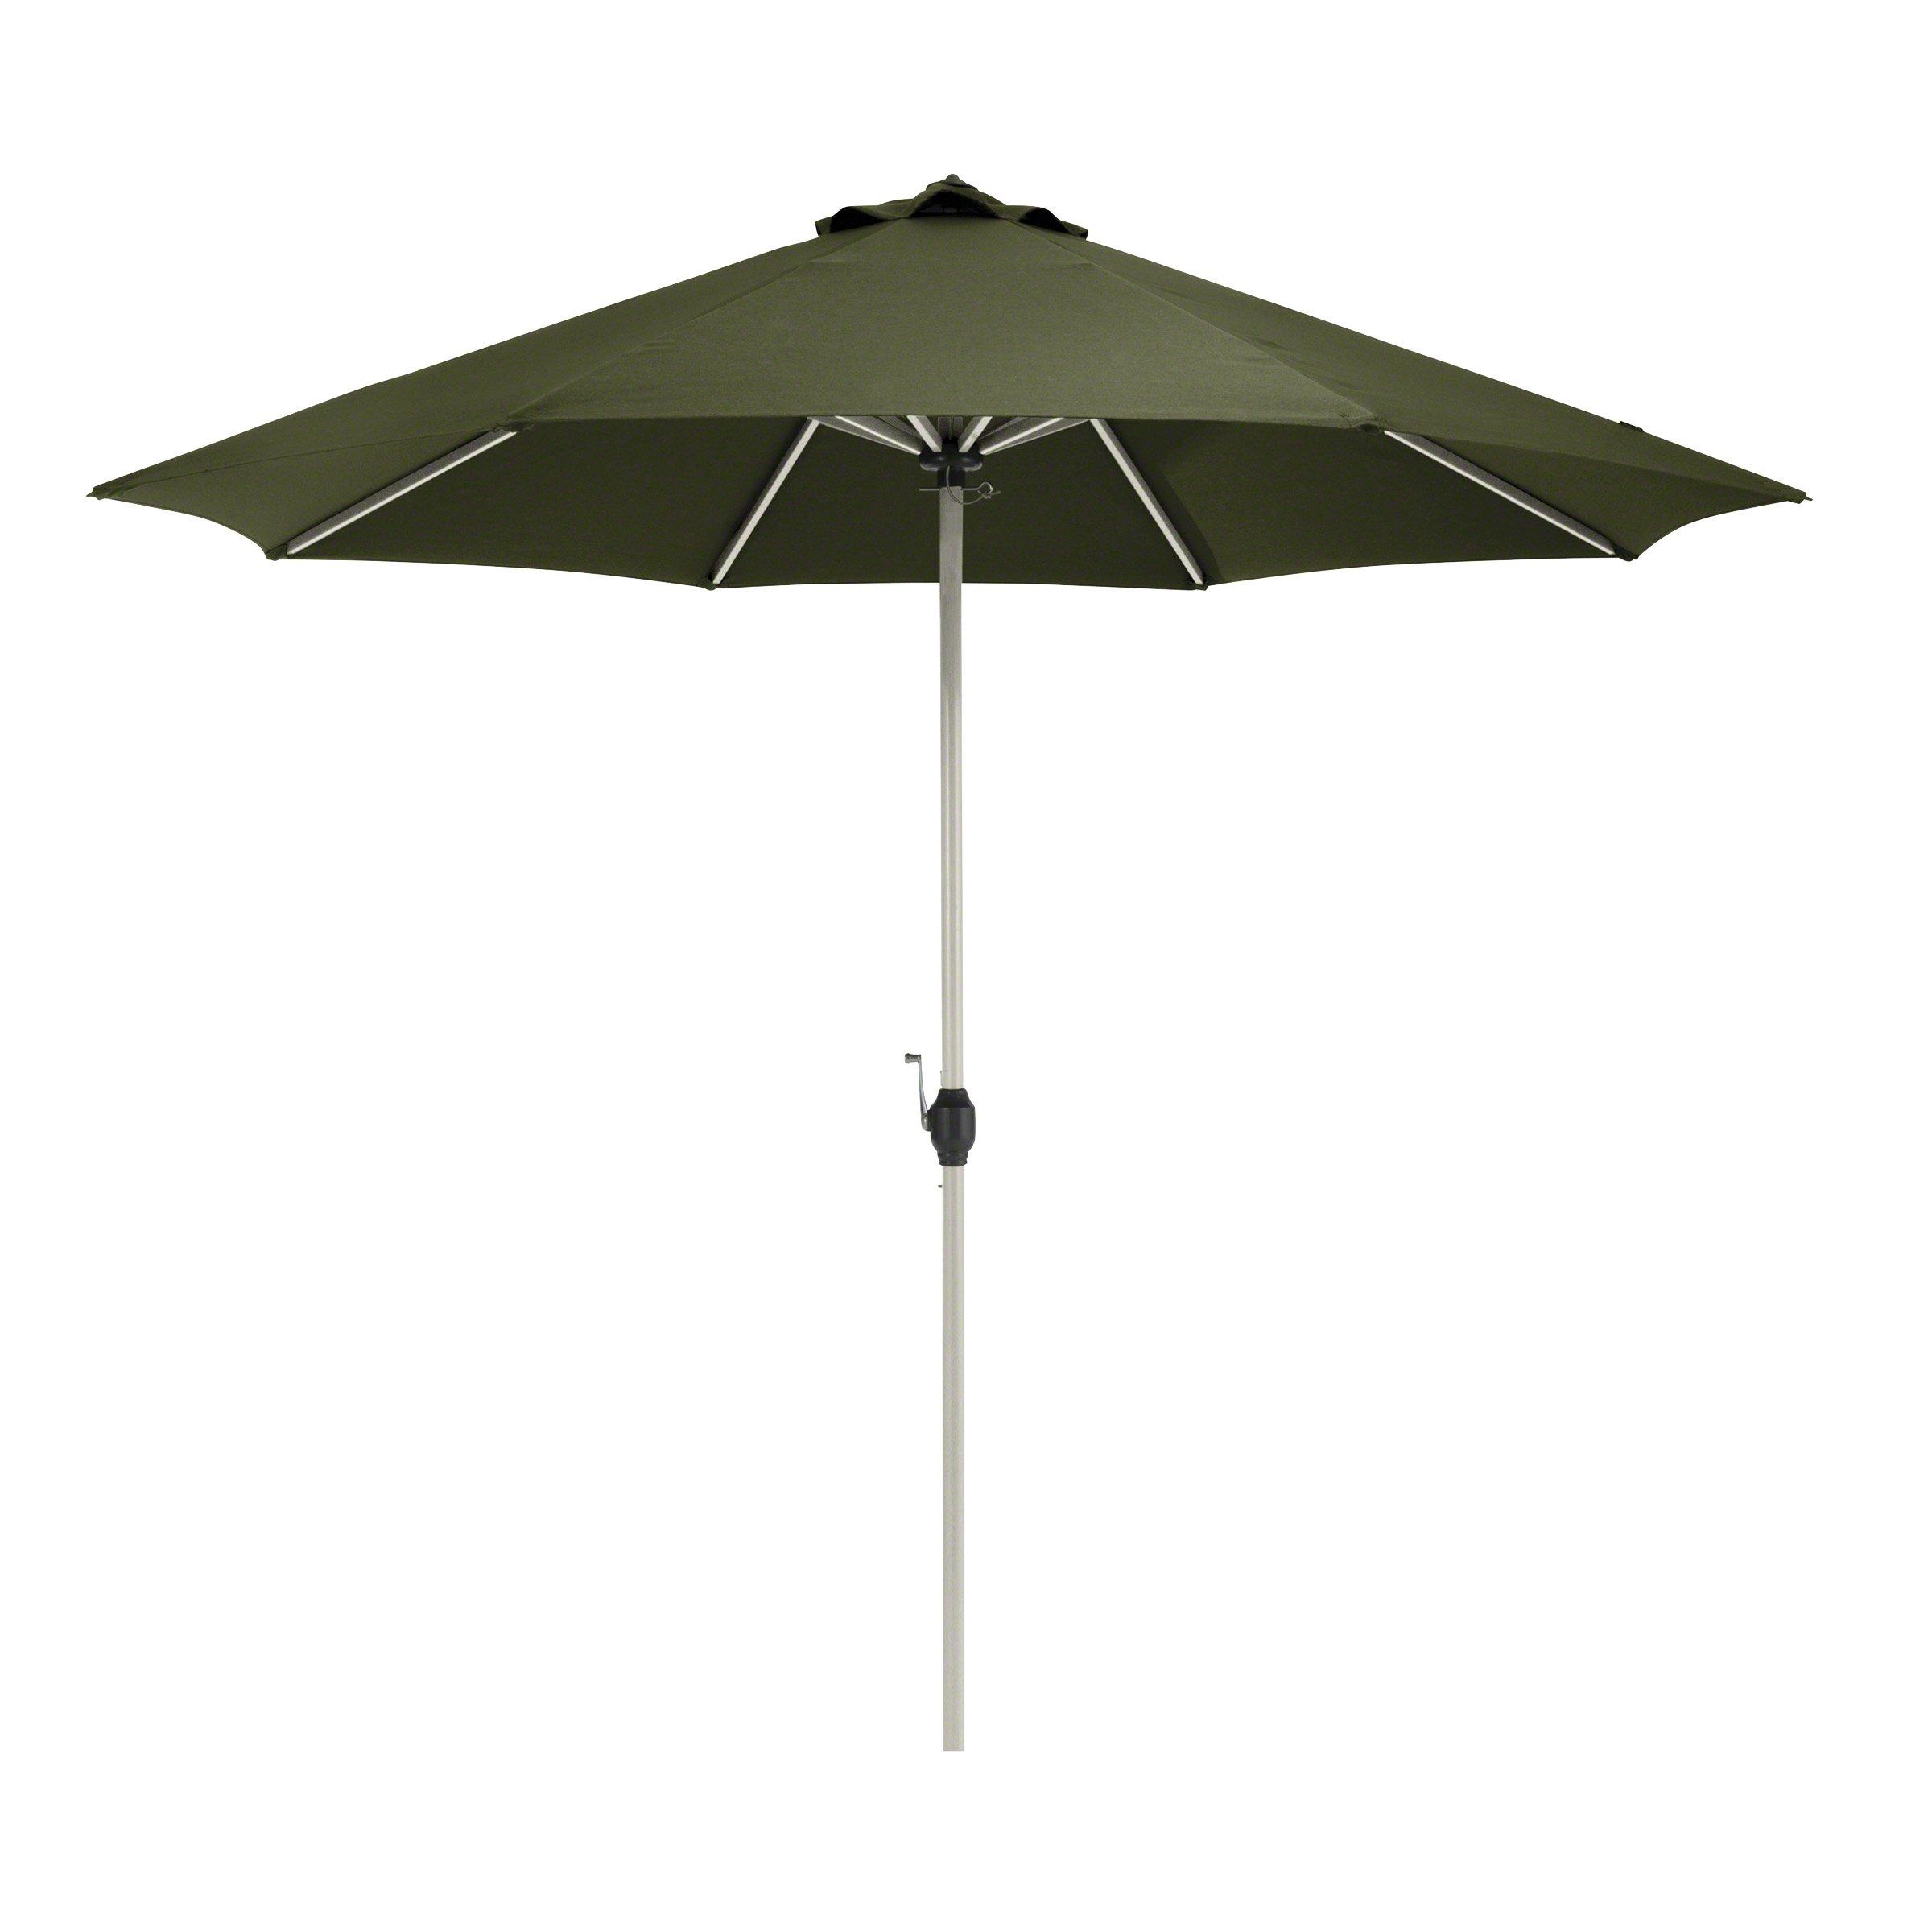 Classic Accessories Montlake FadeSafe 9-Foot Round Aluminum Patio Umbrella, Heather Fern by Classic Accessories (Image #10)